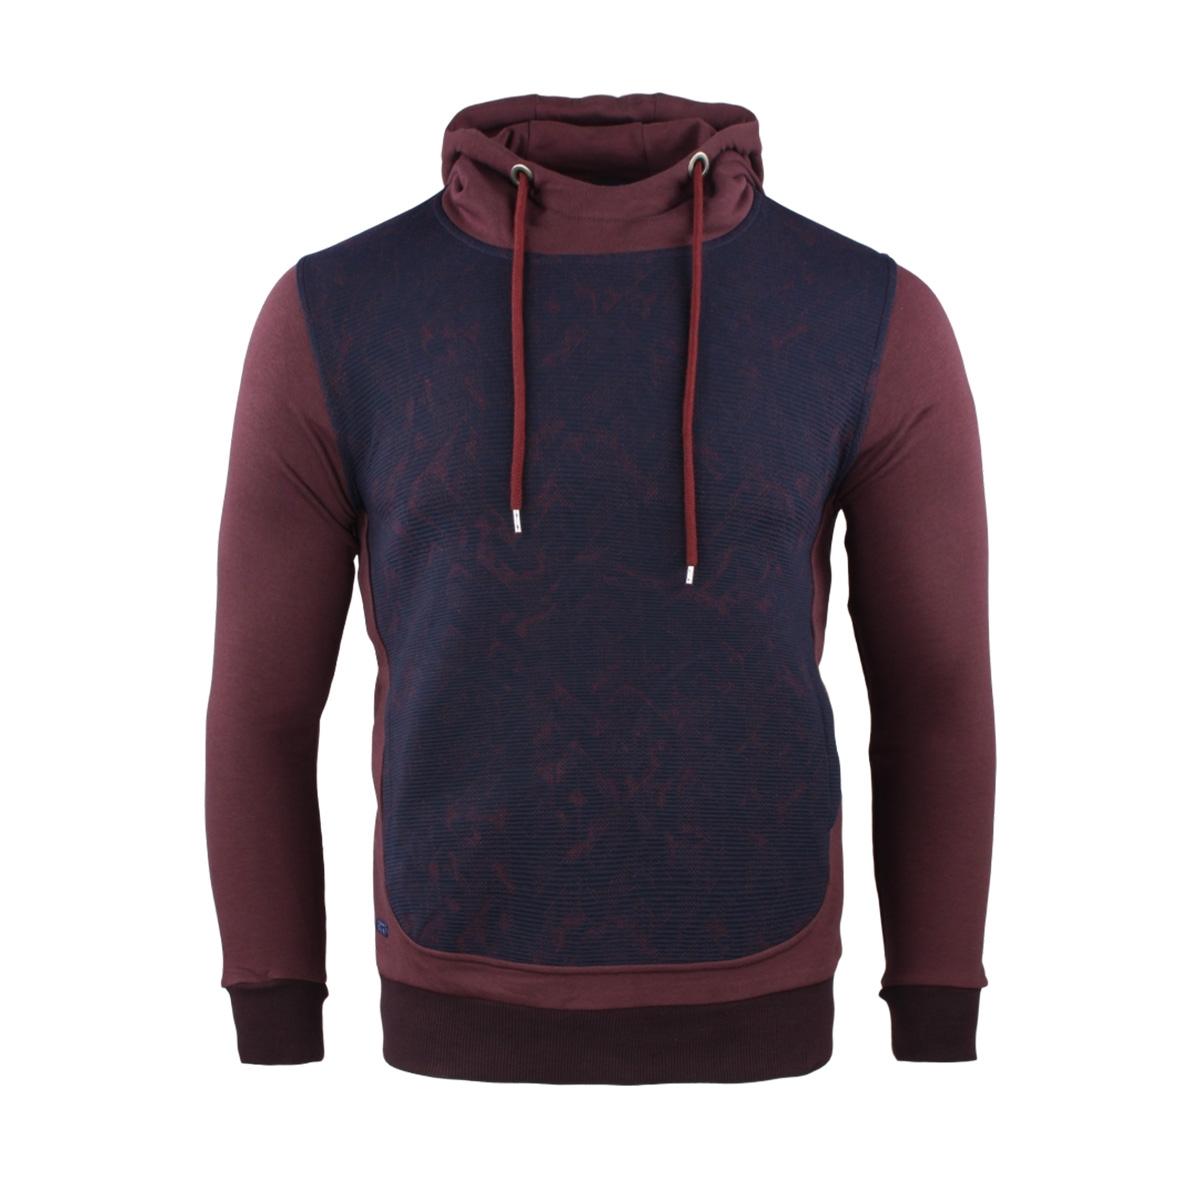 sweater 77081 gabbiano sweater bordeaux